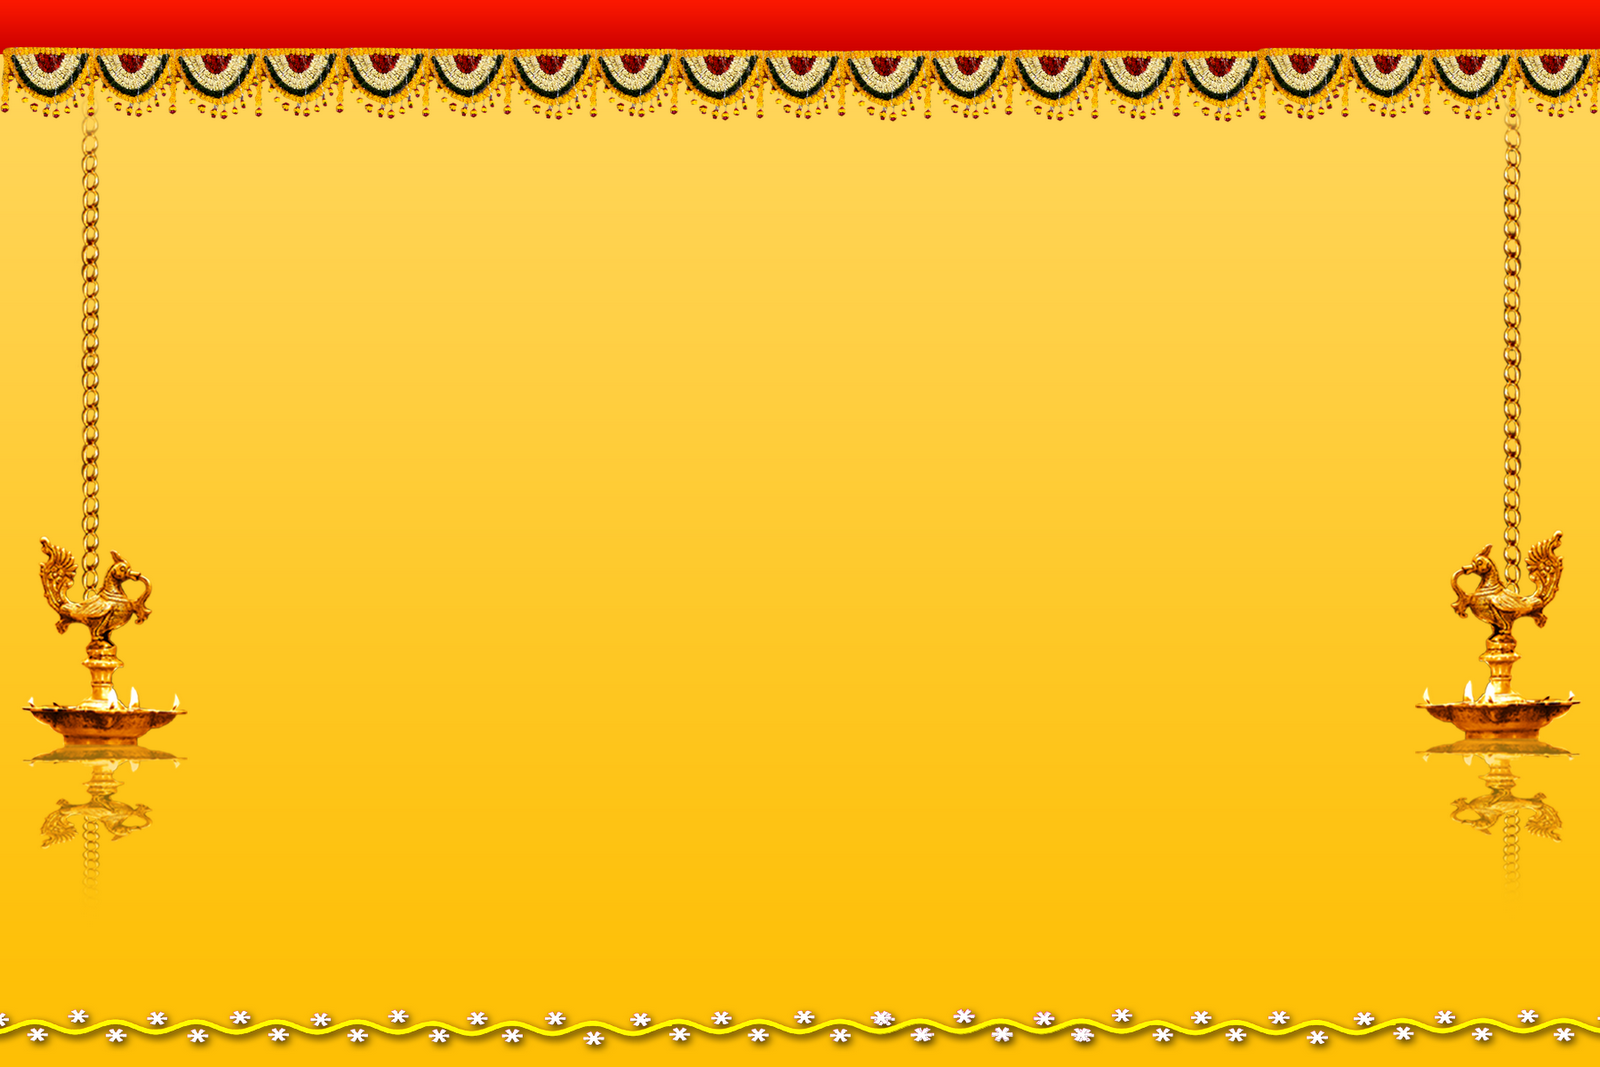 Indian Wedding Invitation Background Designs Free Download Wedding Invitation Background Hindu Wedding Invitations Hindu Wedding Invitation Cards